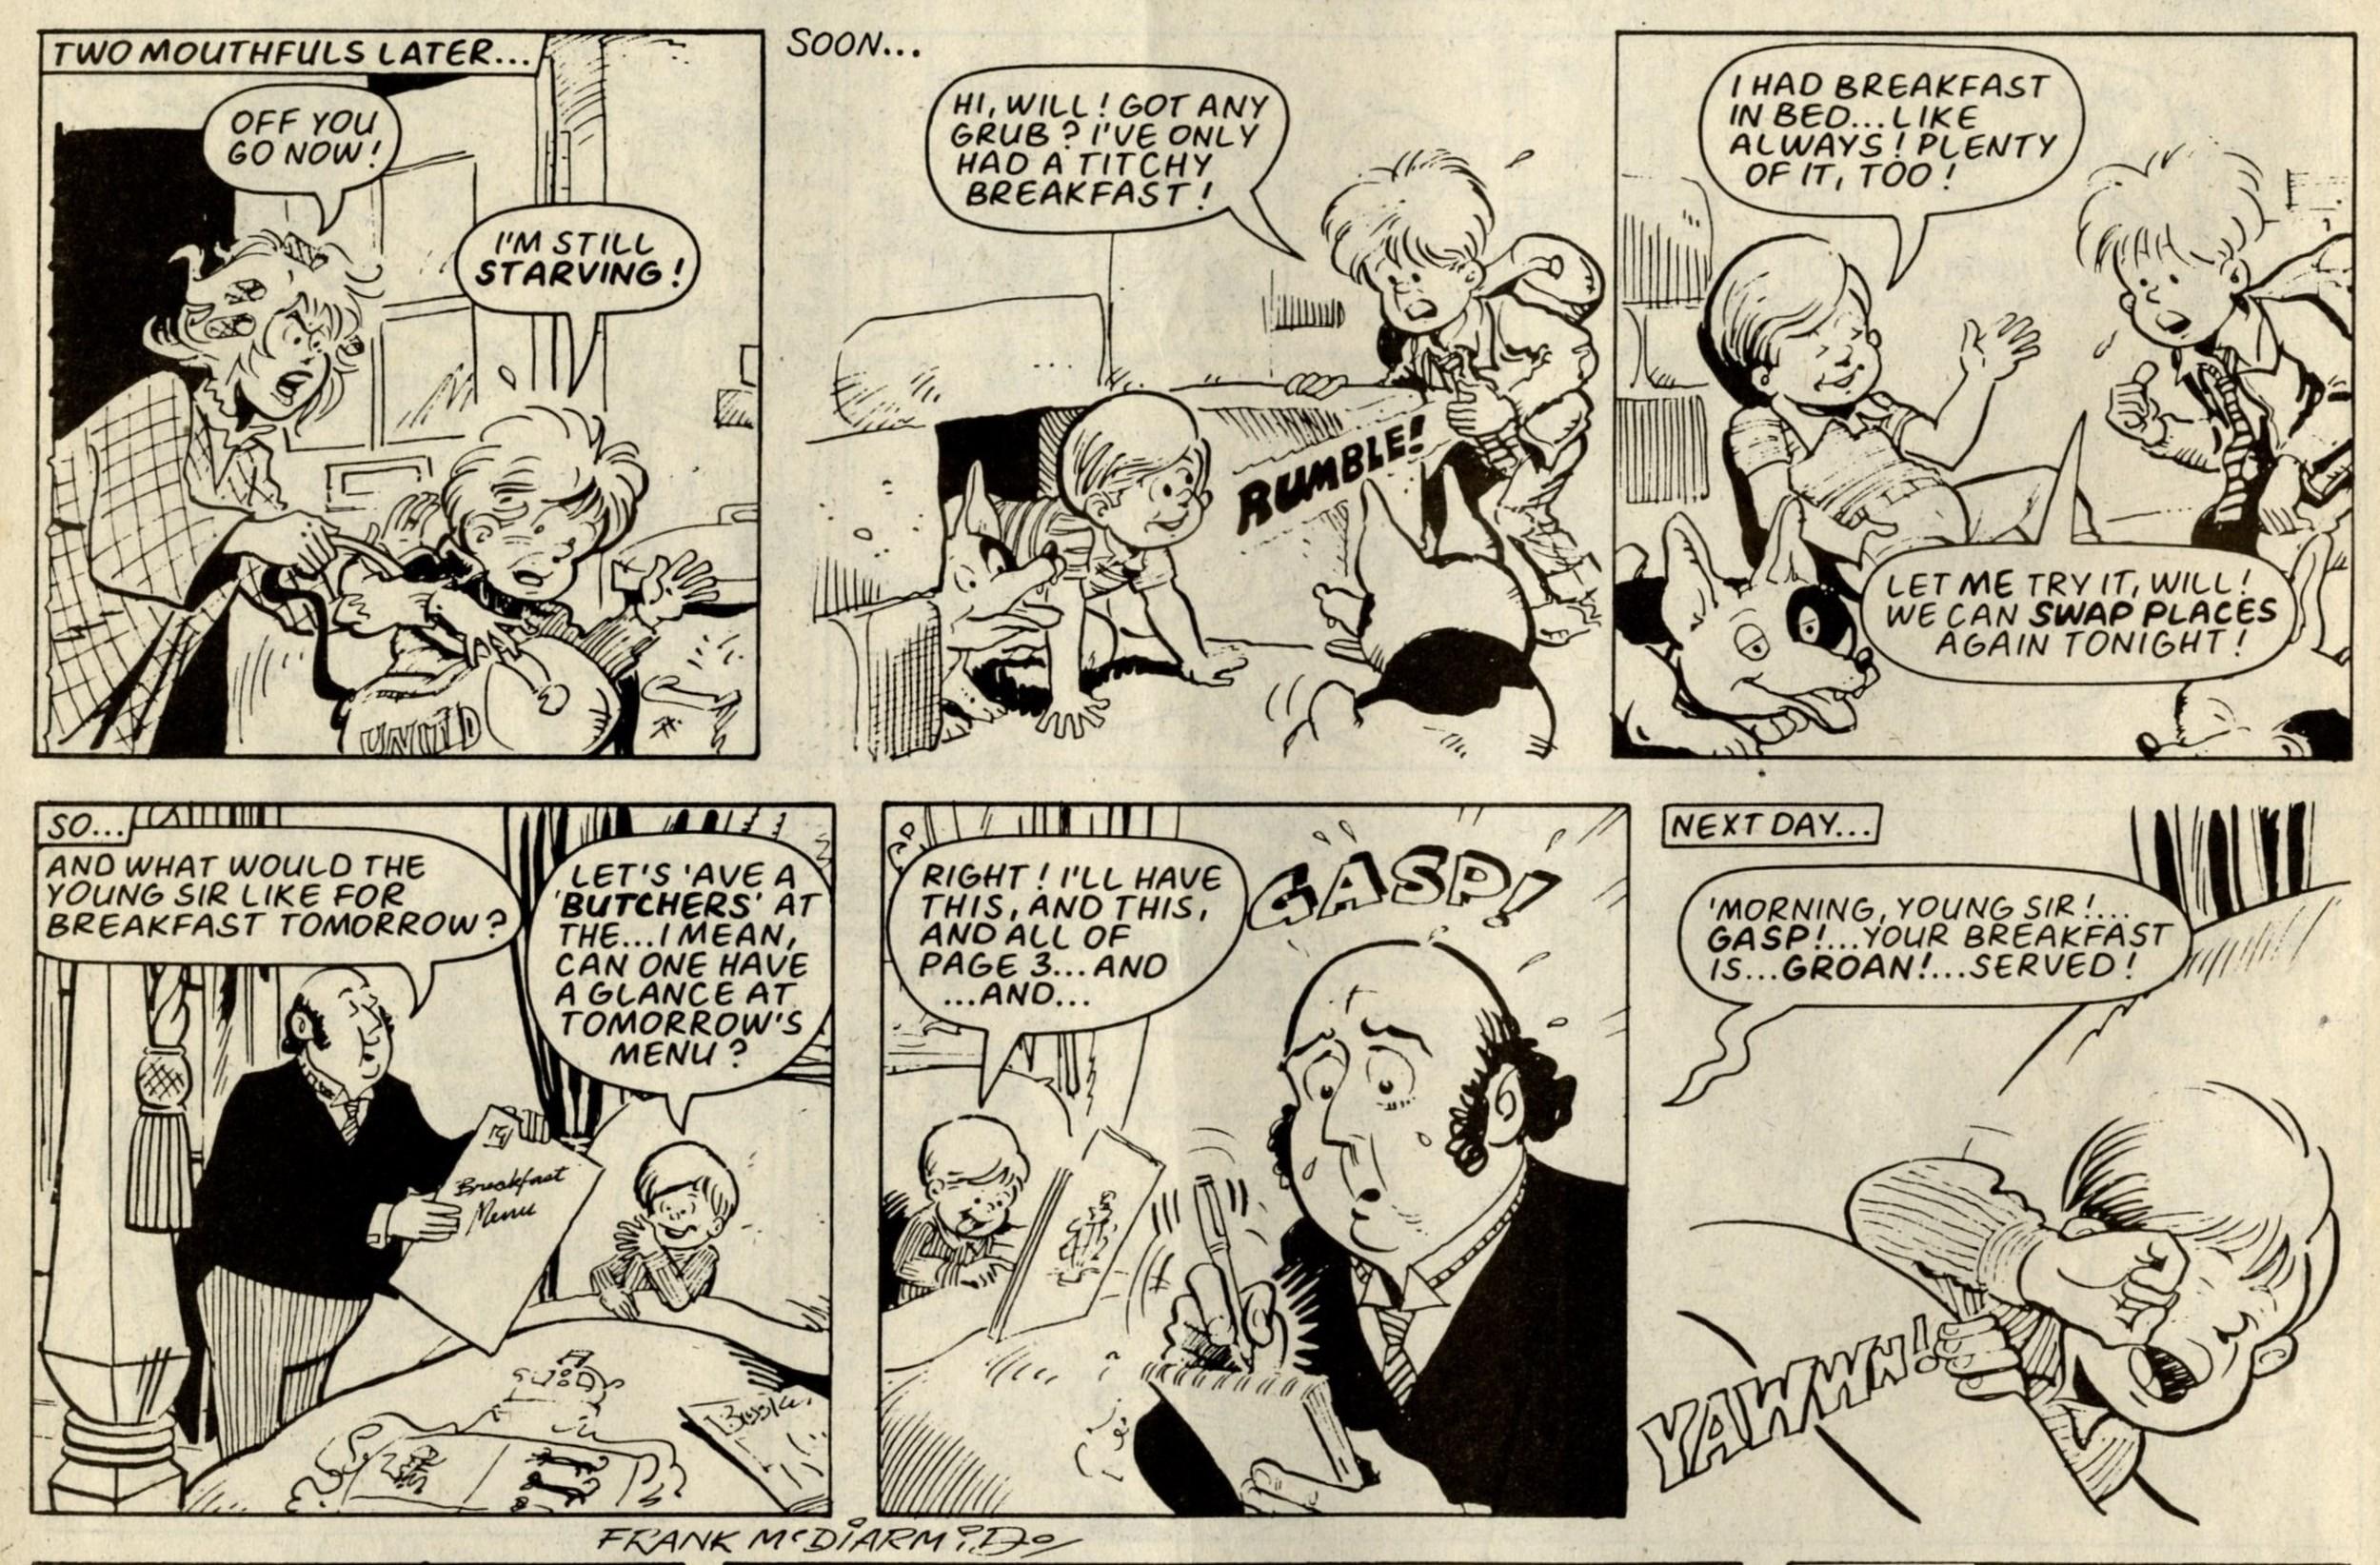 Will and Bill: Frank McDiarmid (artist)